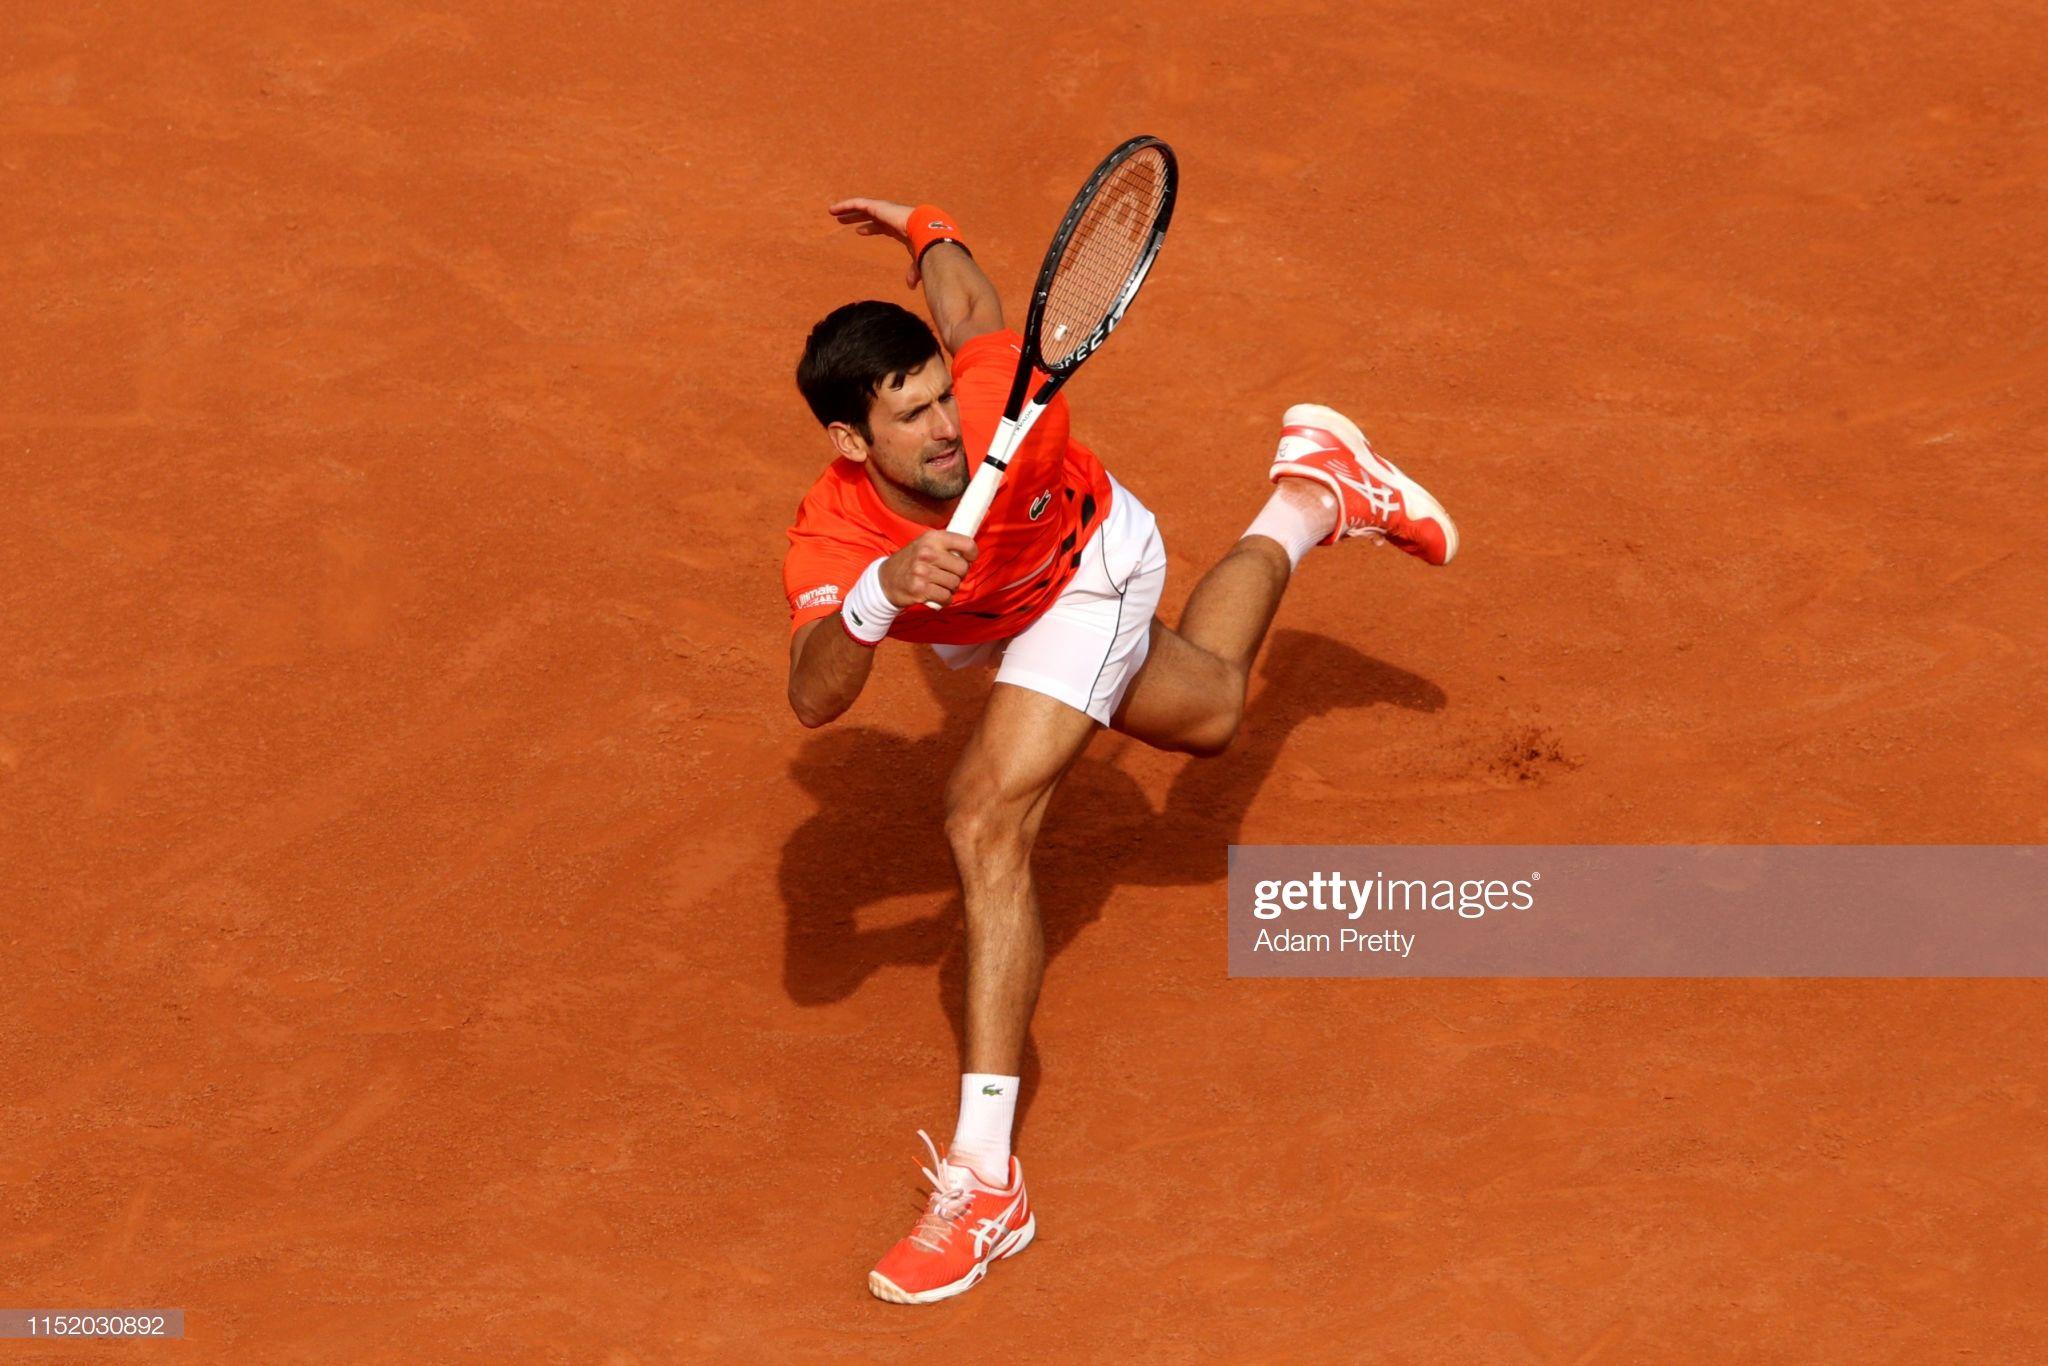 Novak Djokovic Of Serbia Plays A Forehand During His Mens Singles Novak Djokovic Men Serbia